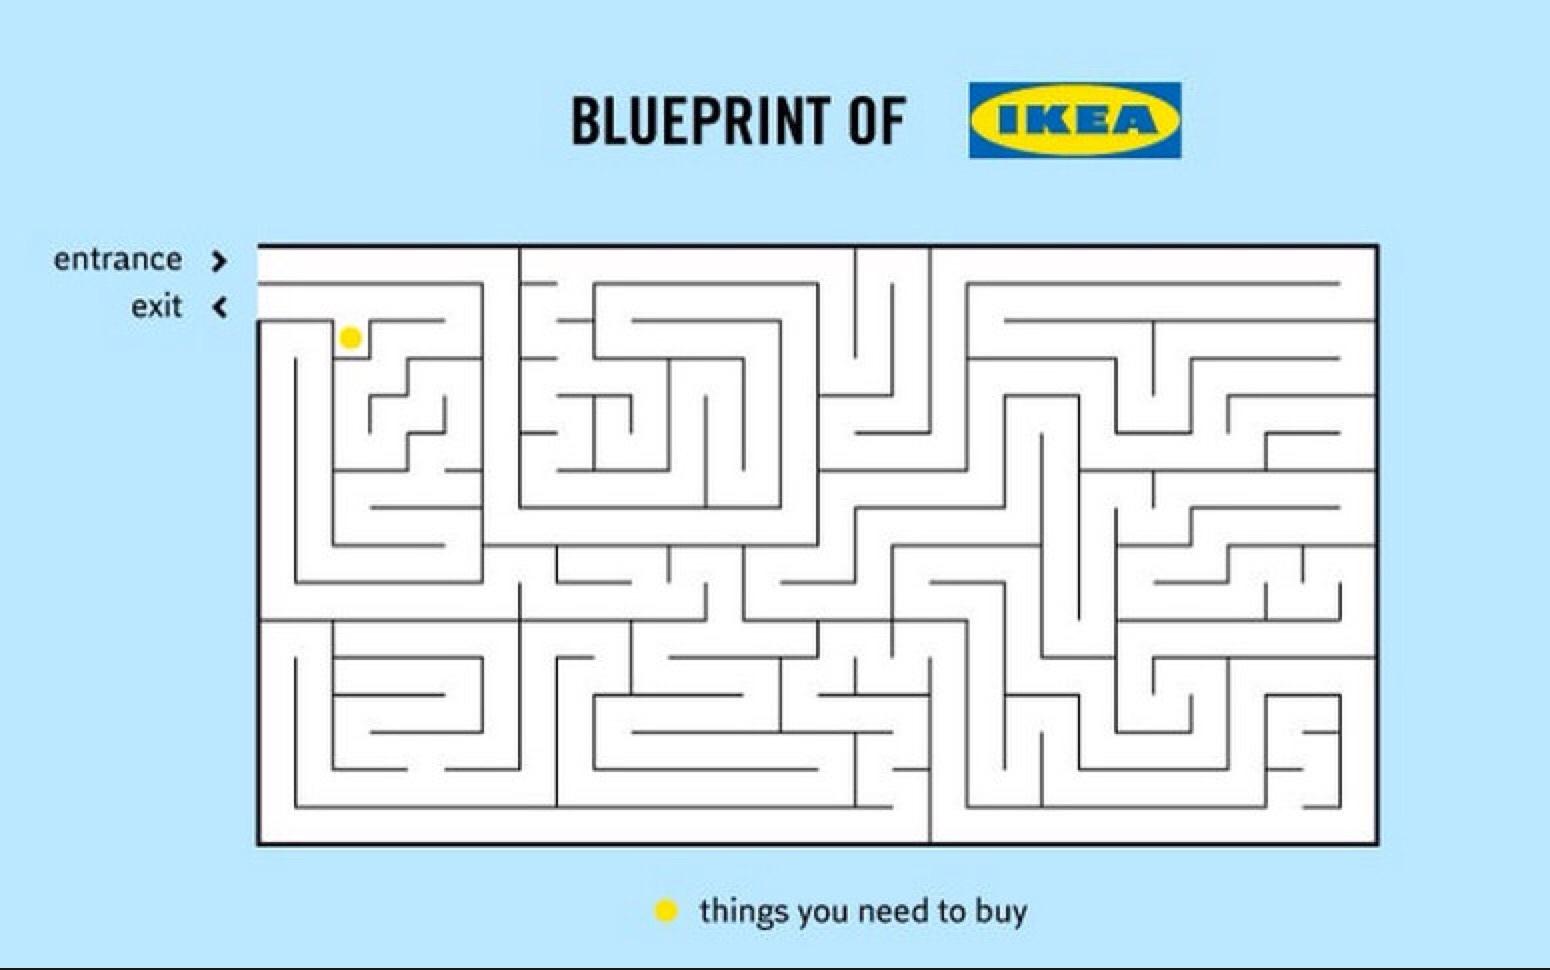 IKEA IKEA IKEA - meme